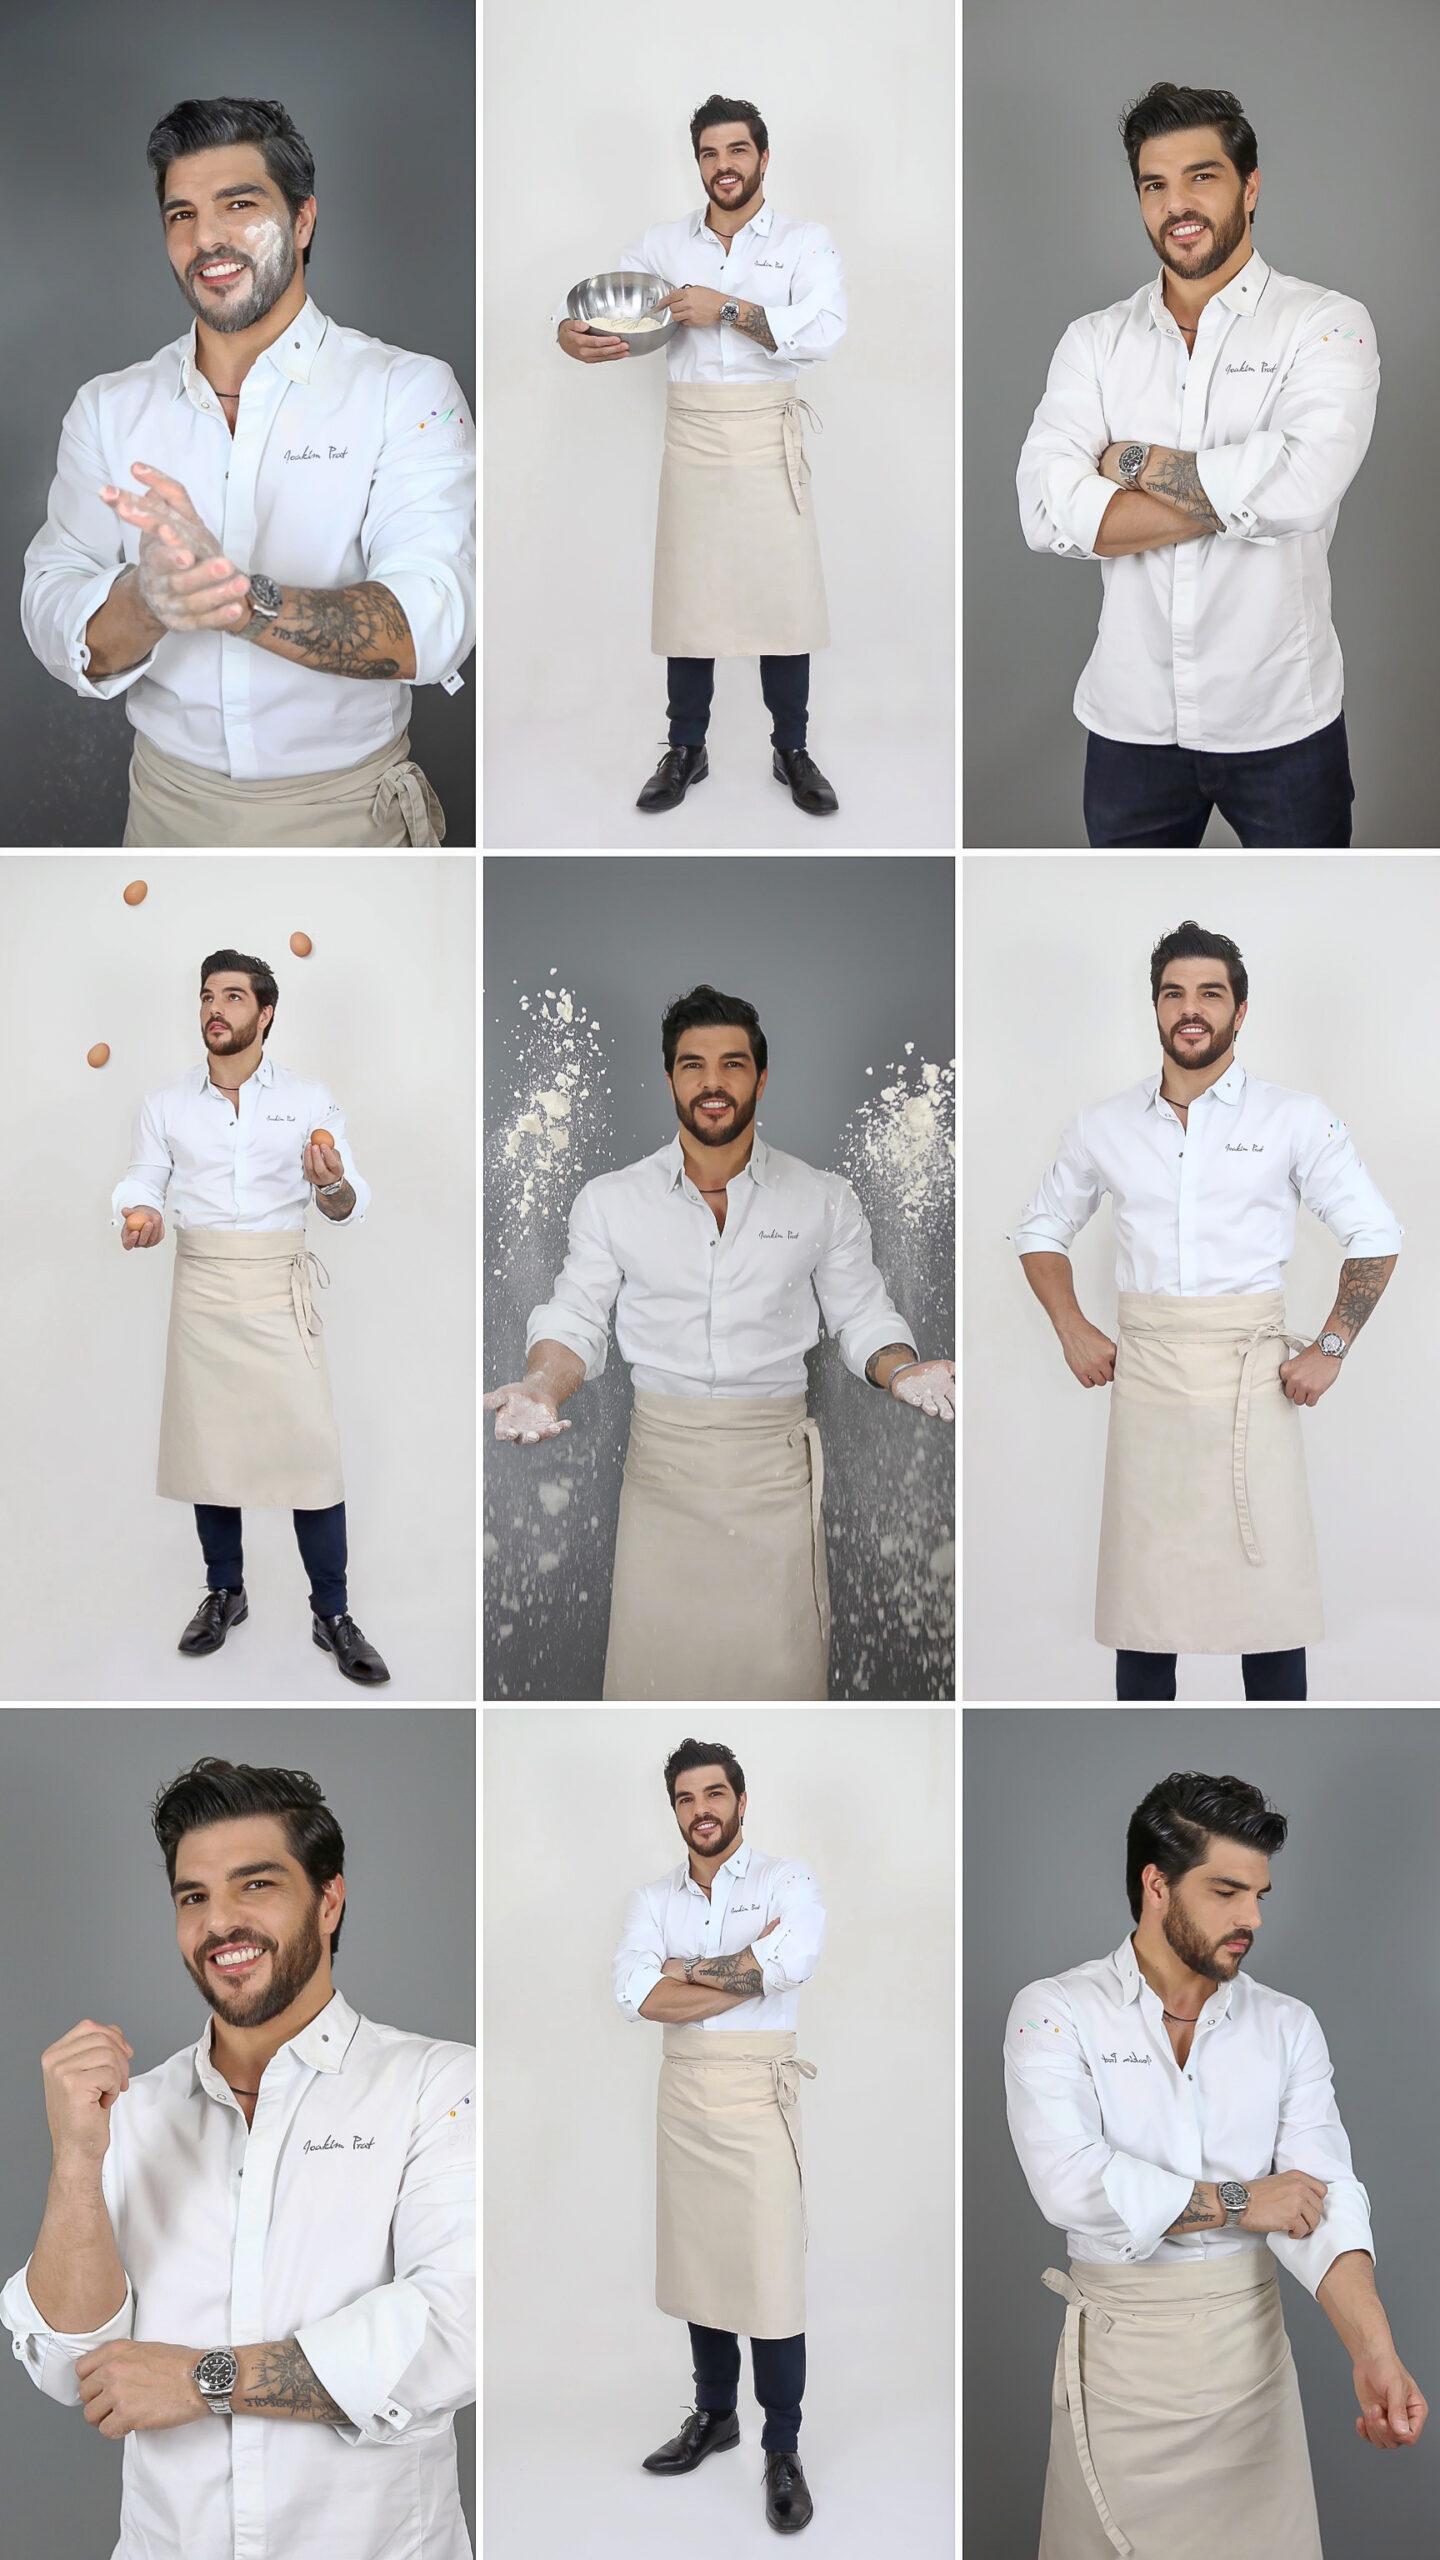 Jaokim Michelin Pastry Chef